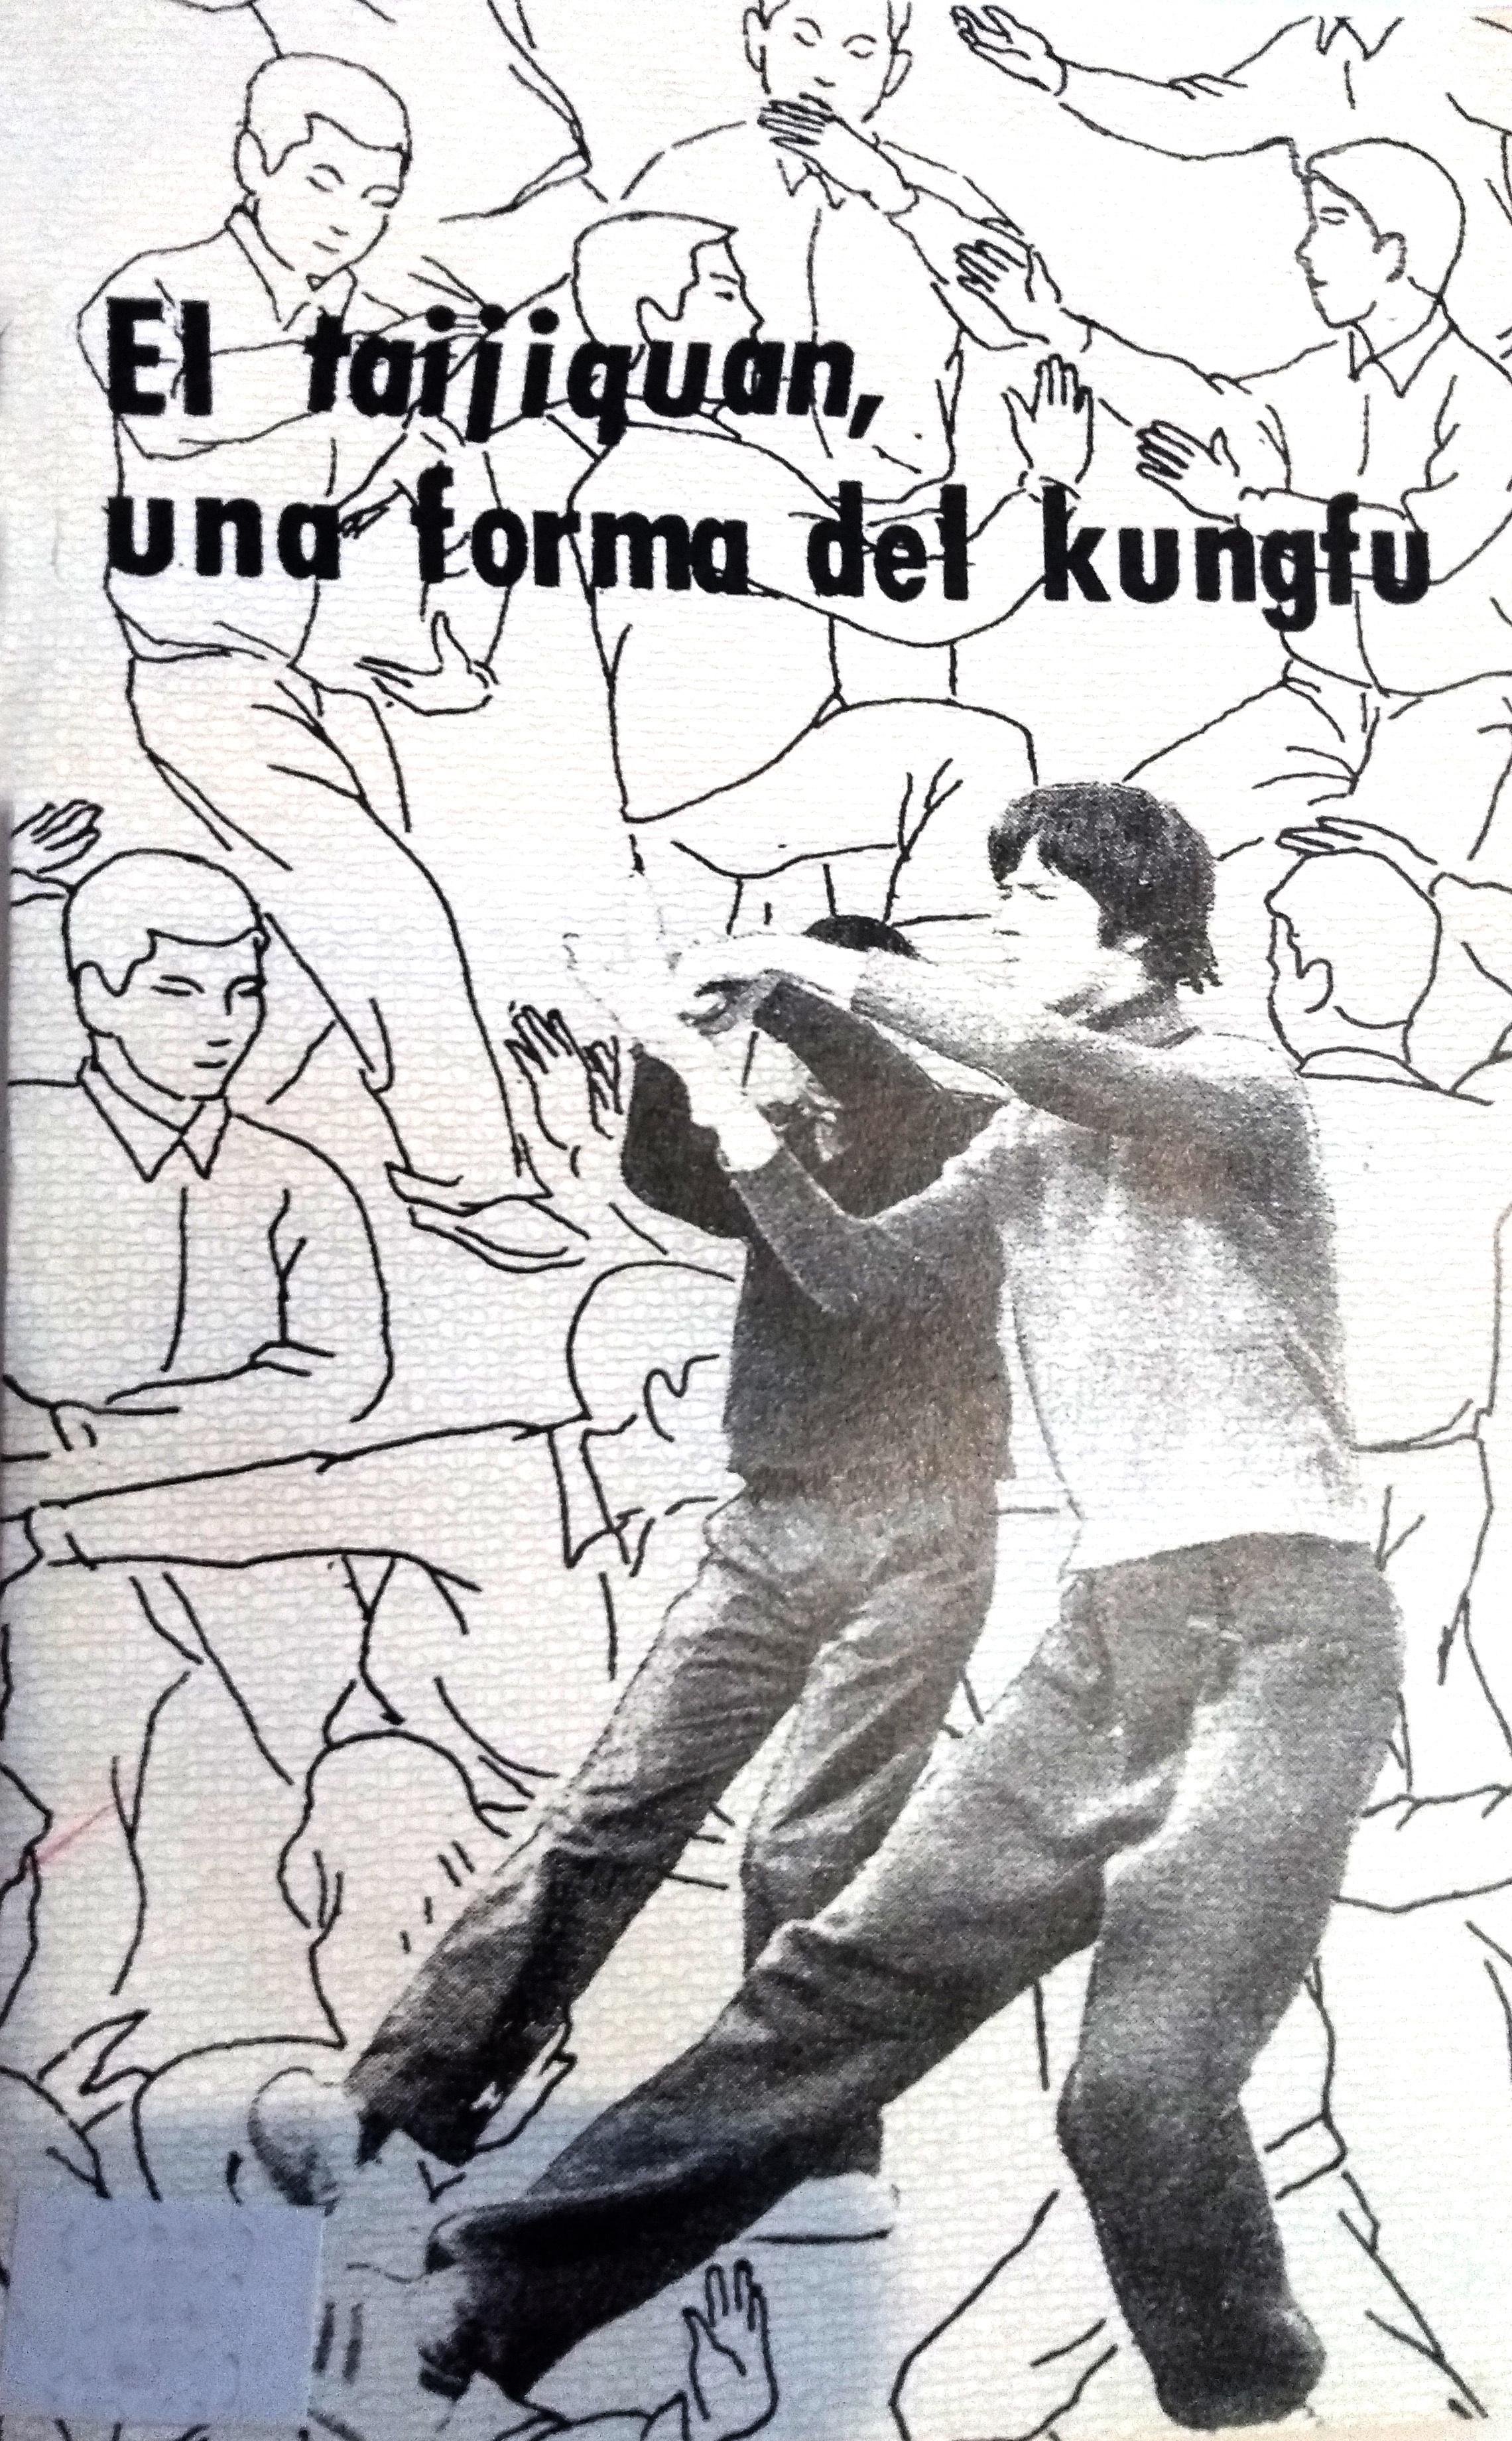 El Taijiquan, una forma del kung fu. Forma 24 00231